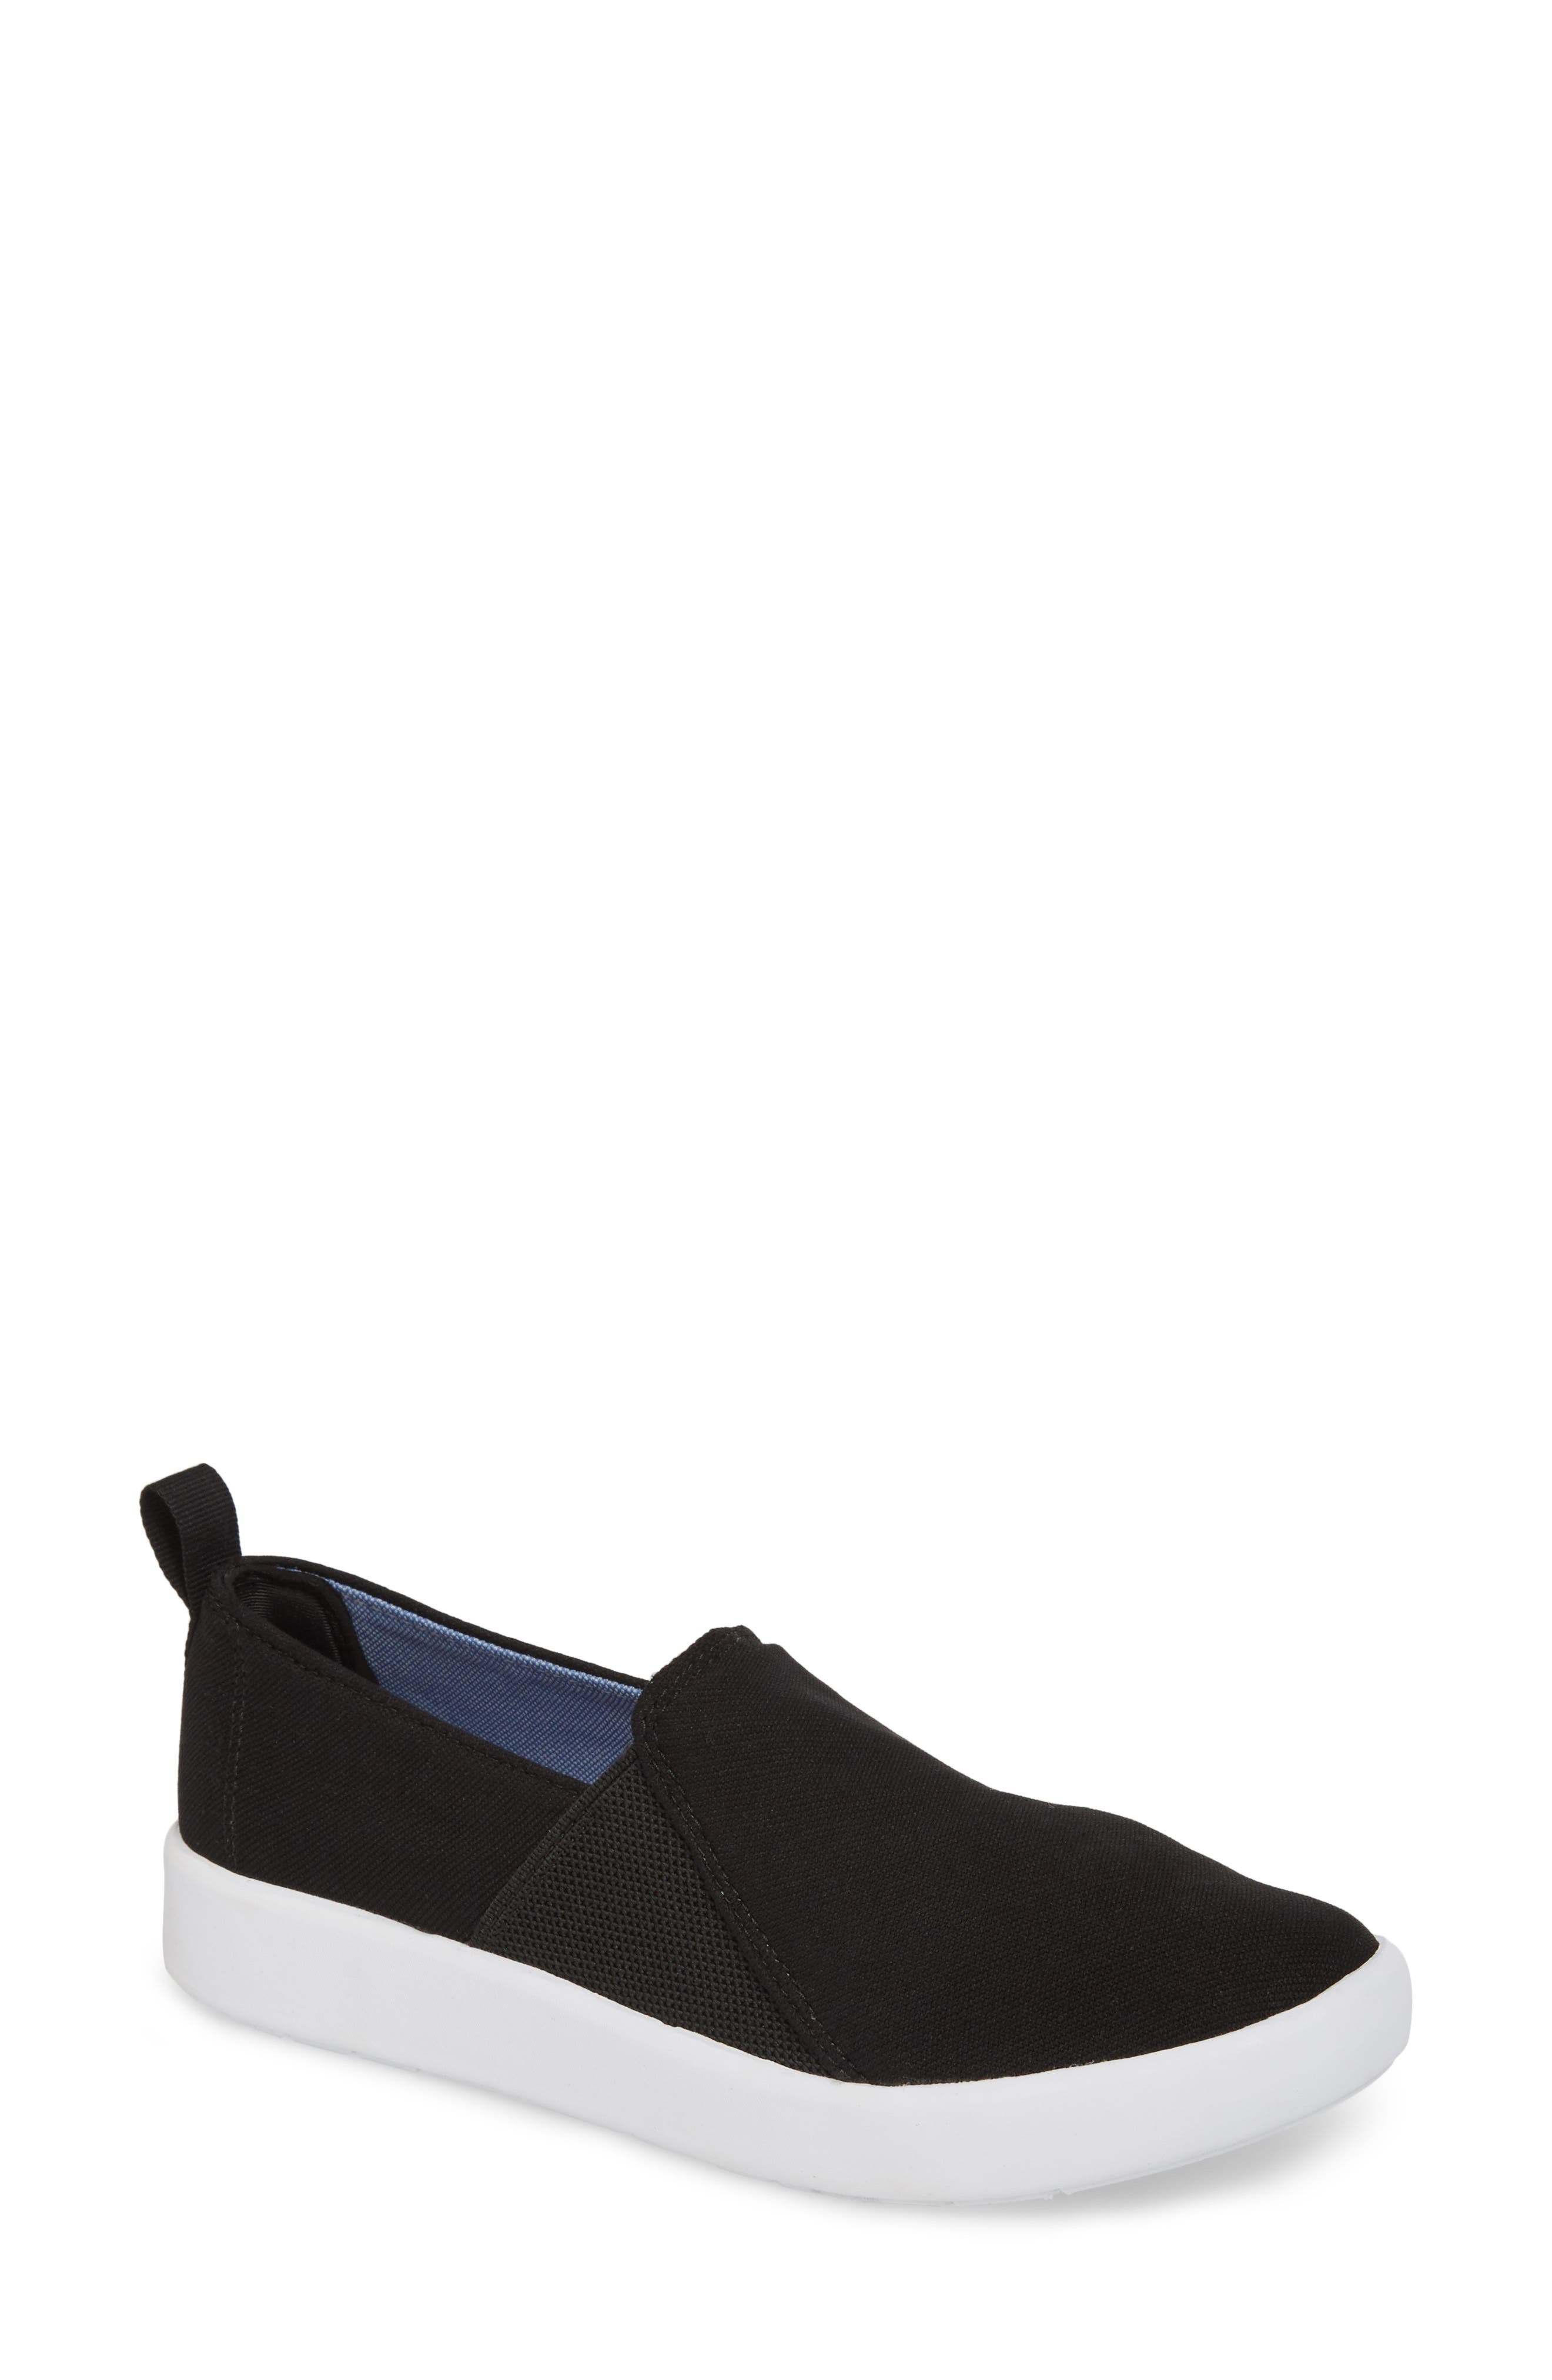 Studio Liv Jersey Slip-On Sneaker,                         Main,                         color, Black